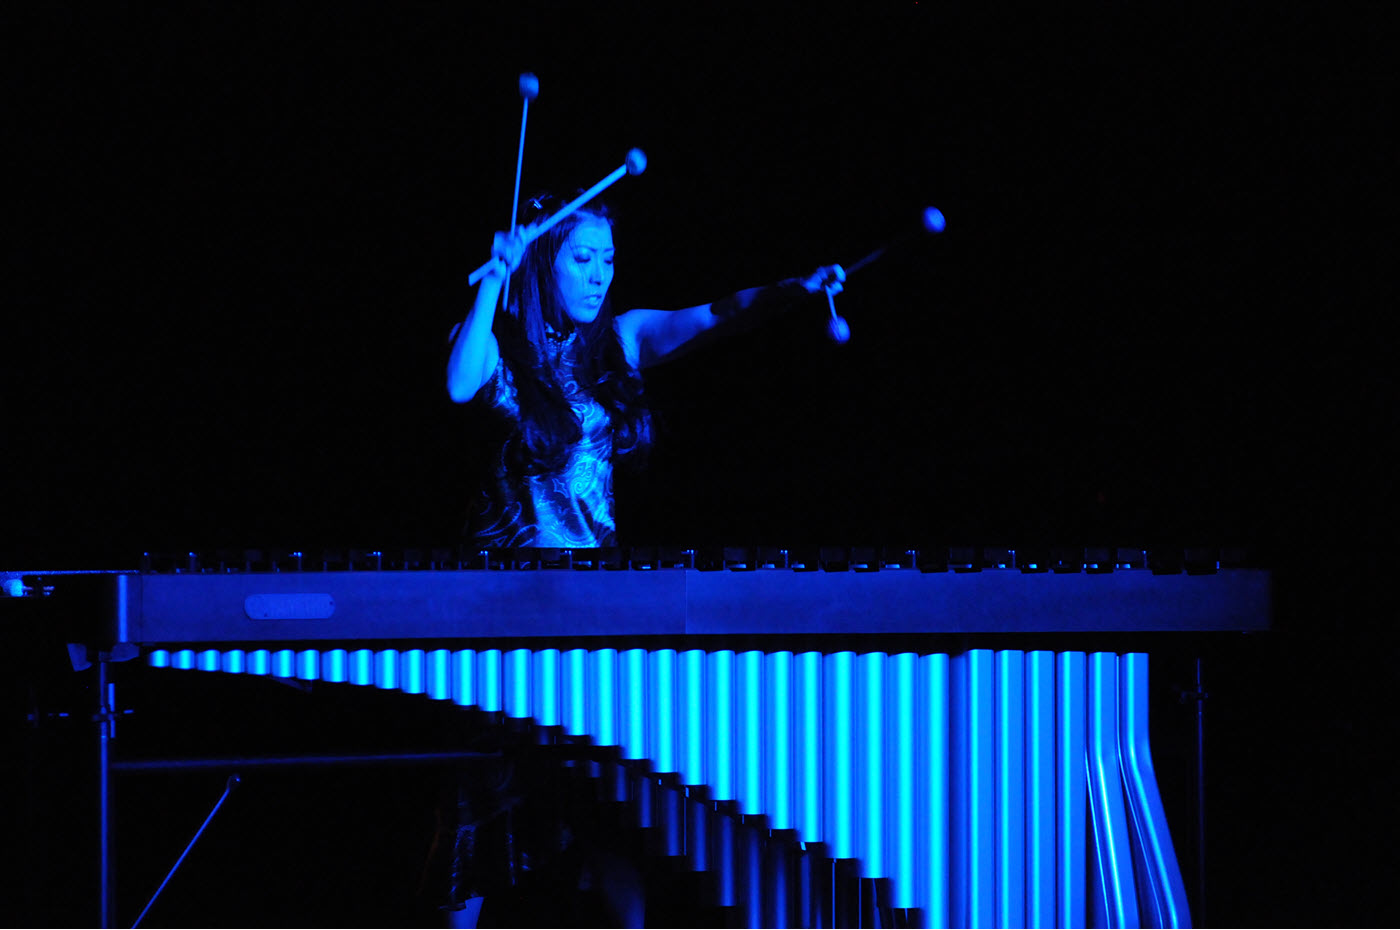 Woman on stage playing marimbas.